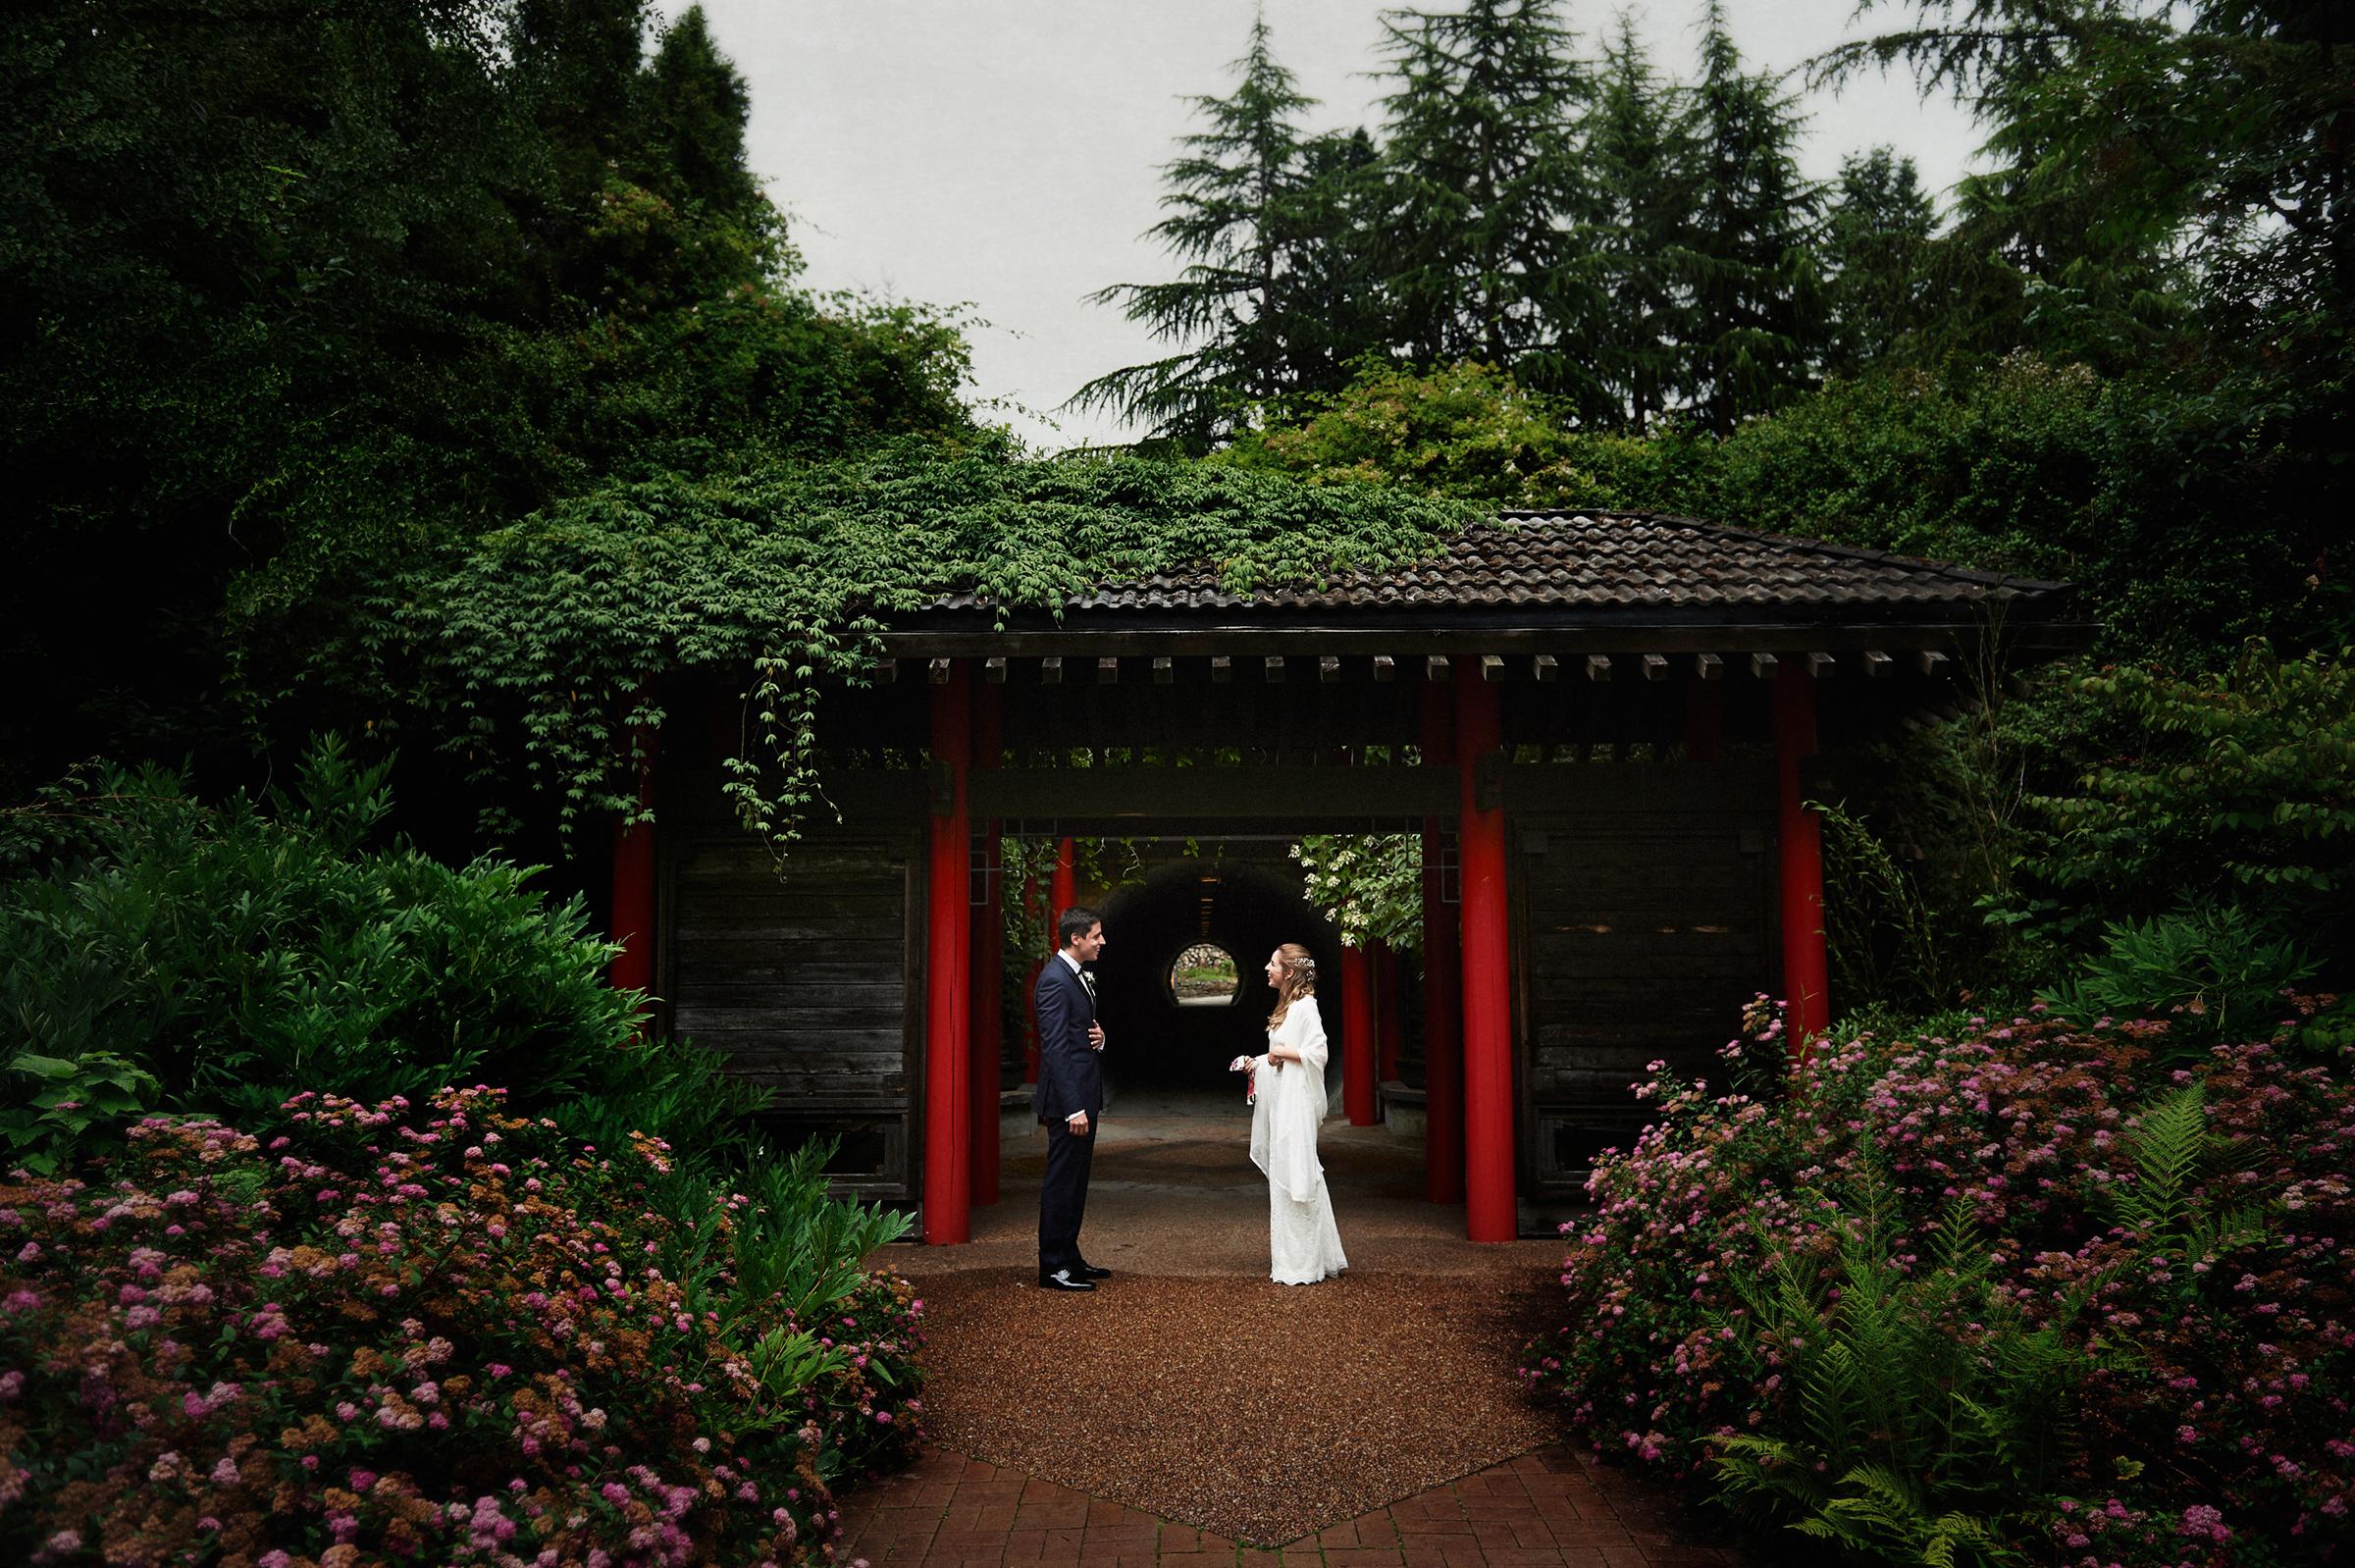 Couple at botanical garden - photo by Jozef Povazan Photography